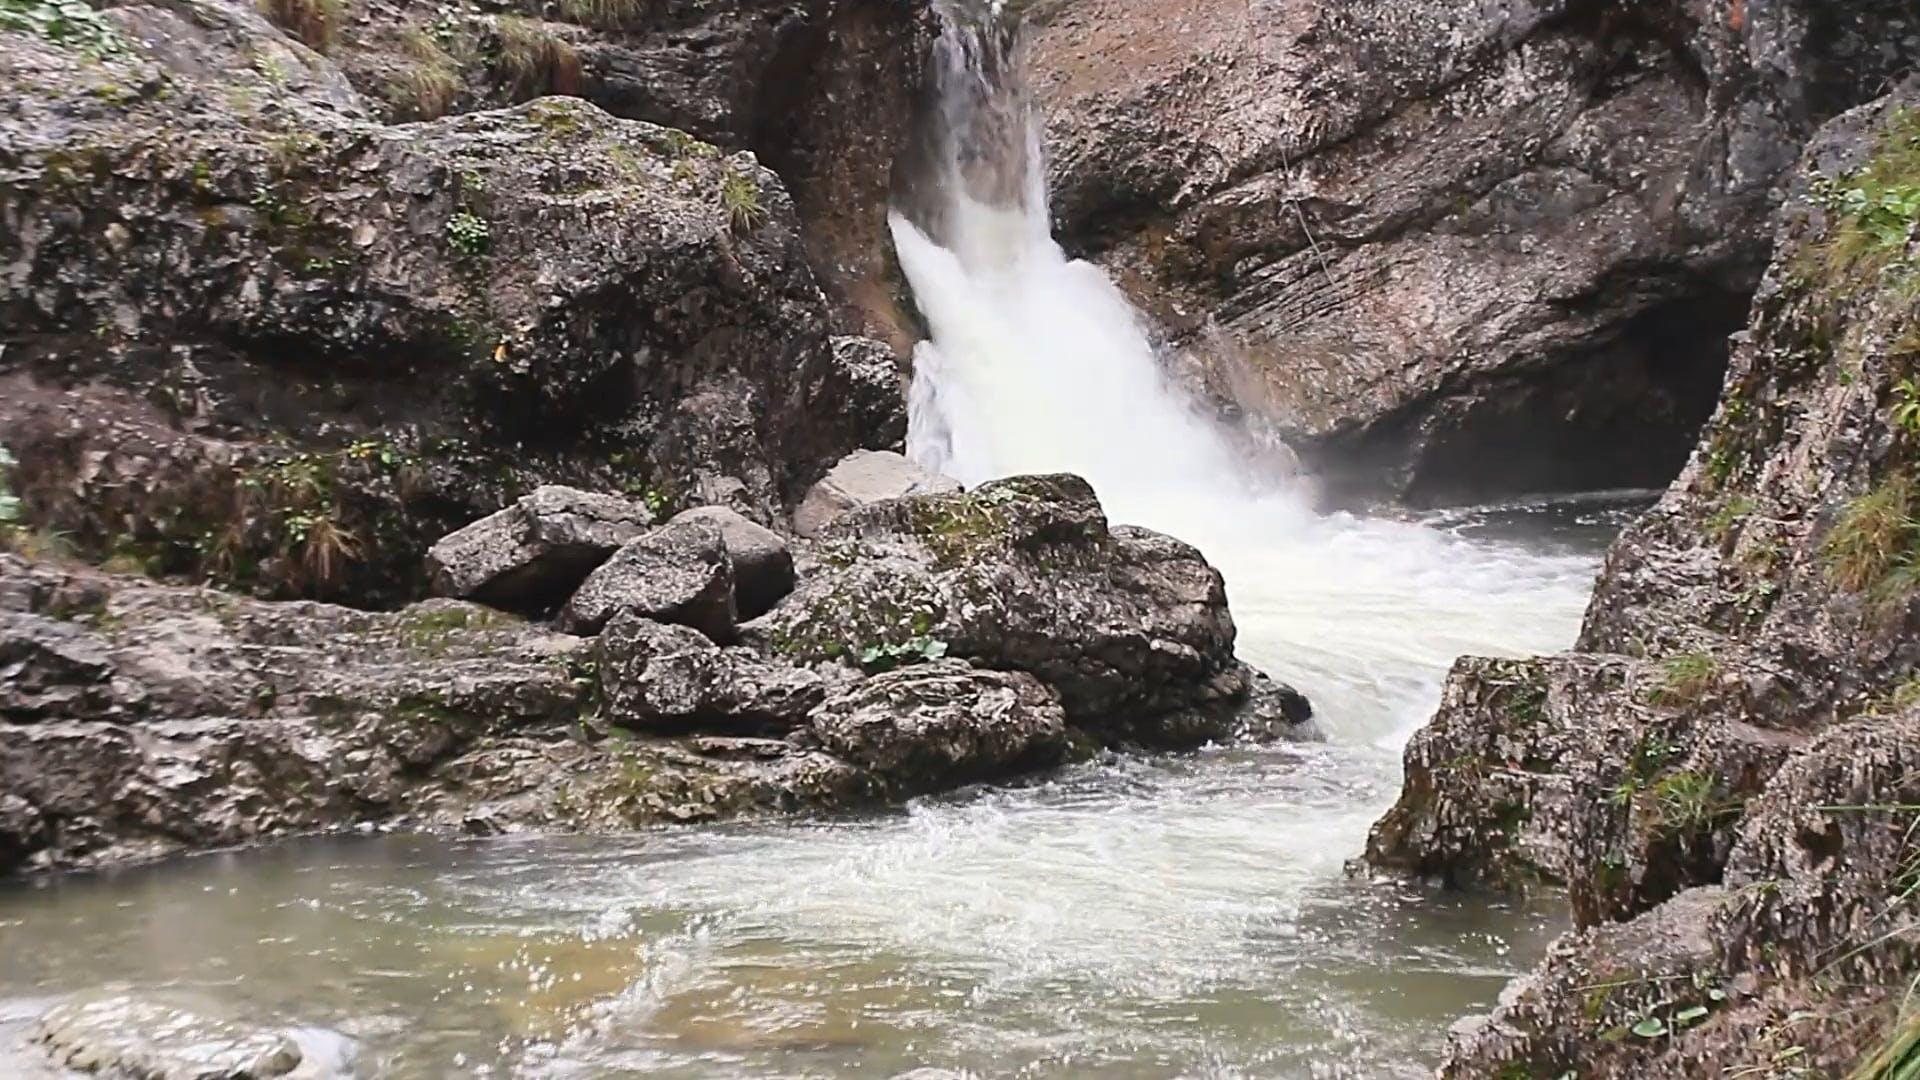 Video Footage Of Waterfall